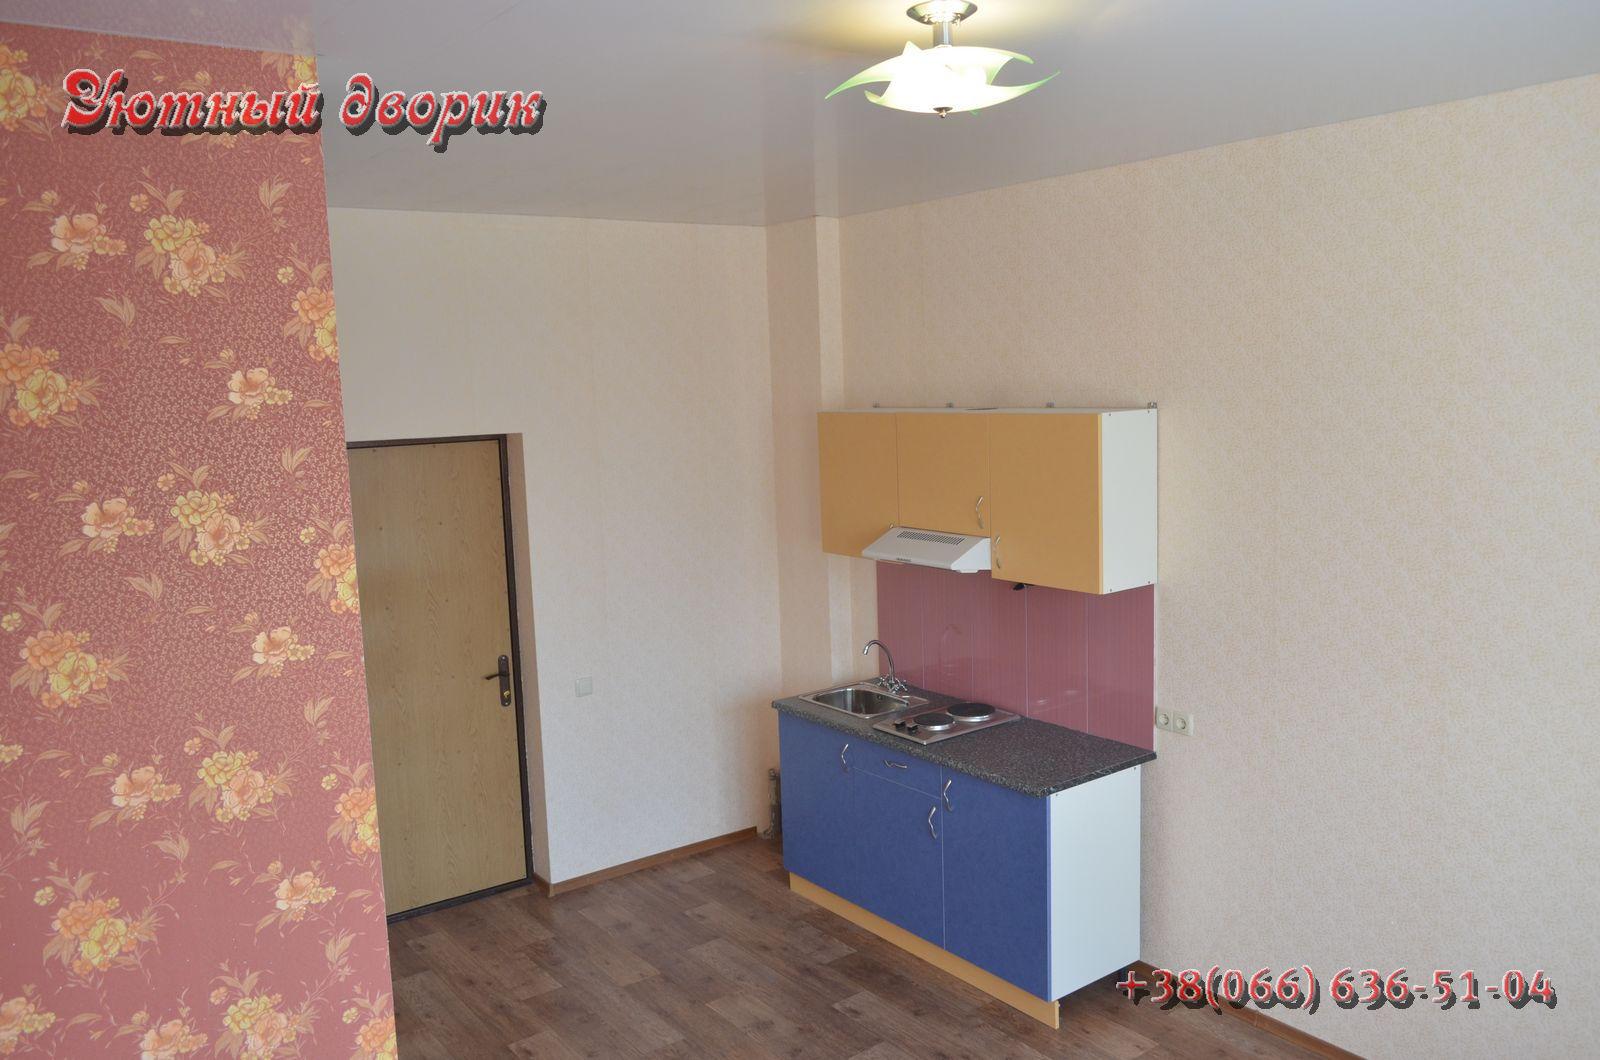 Квартиры хайфлет в Харькове